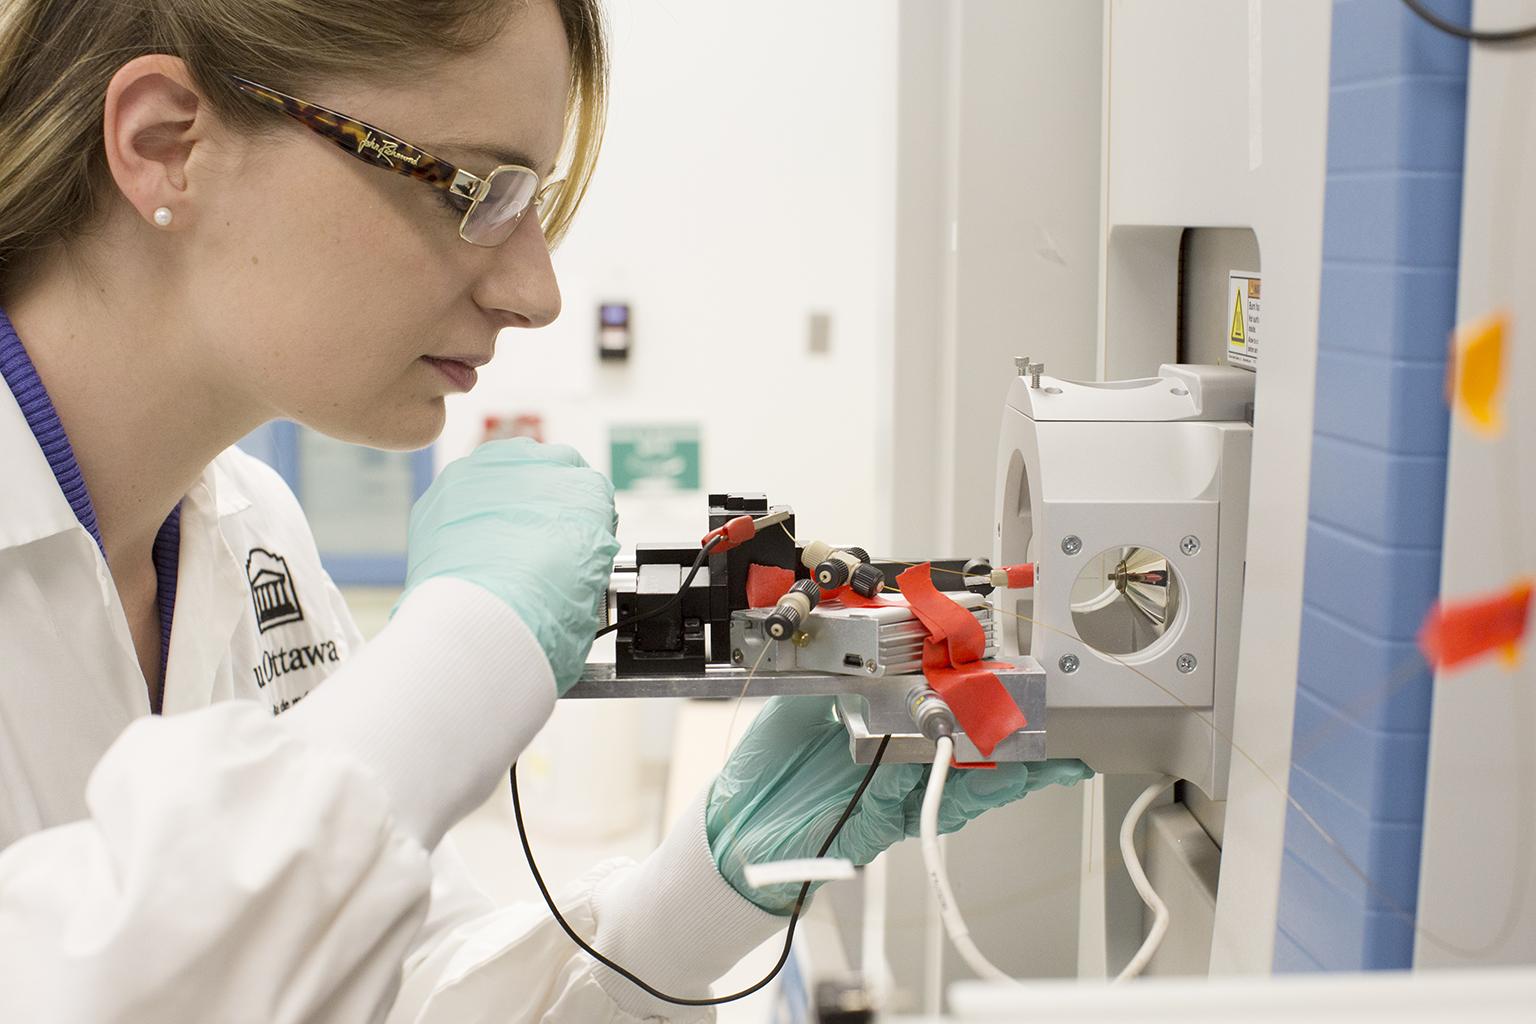 Graduate Student working on a Mass Spec instrument